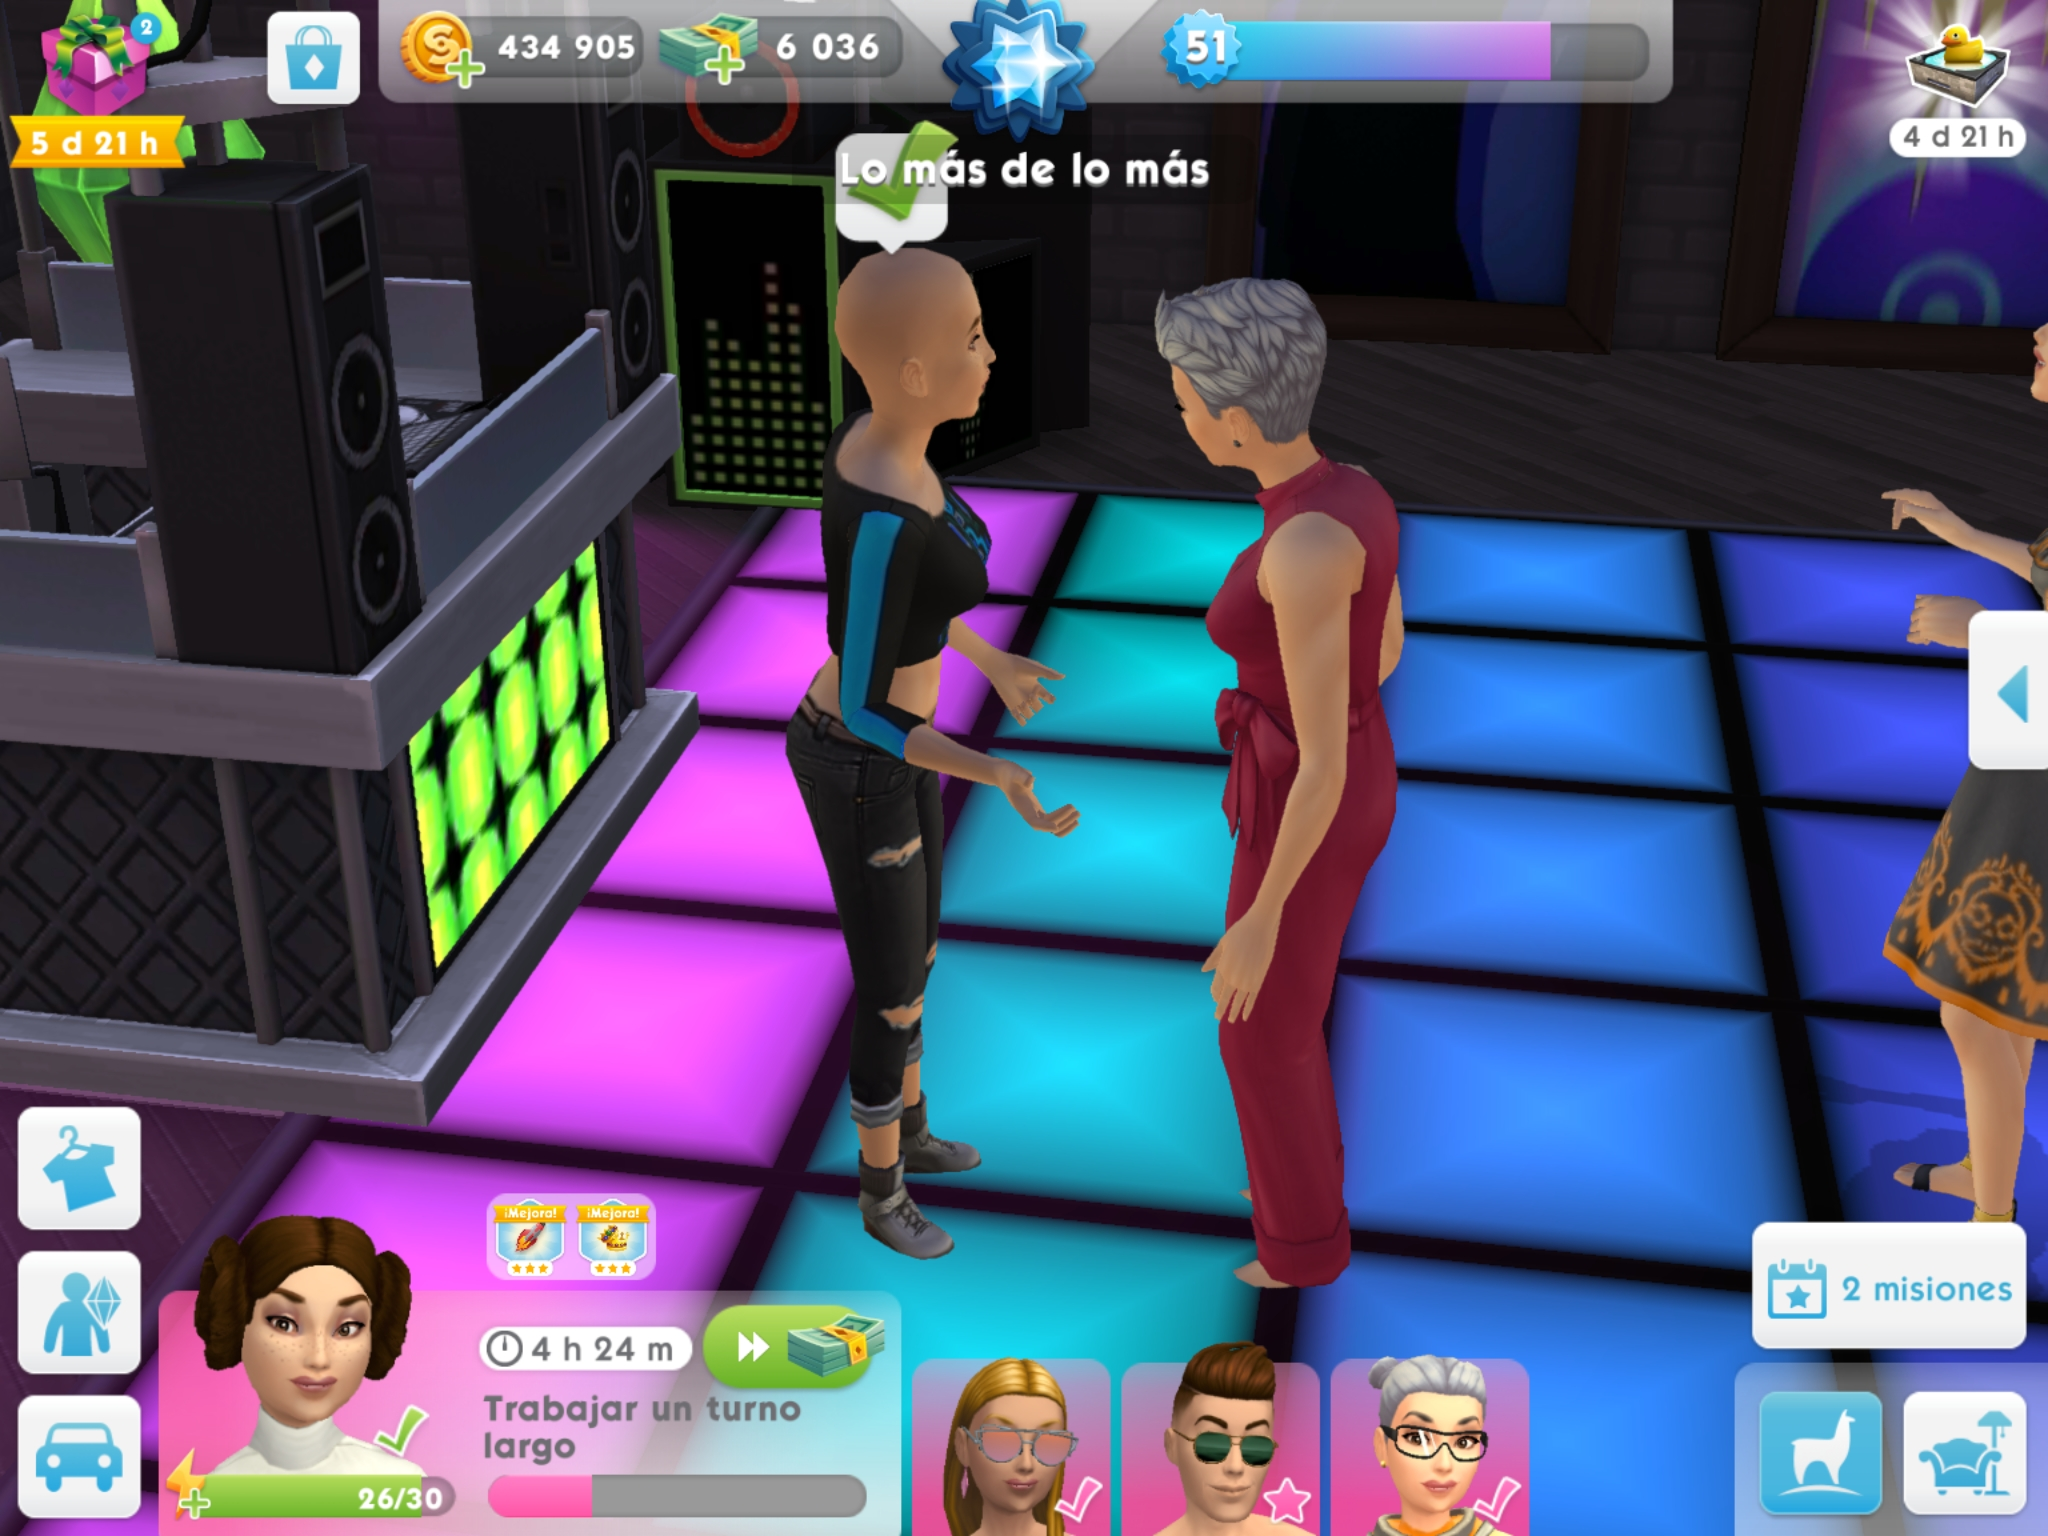 Los Sims_2020-05-05-21-58-12.jpg